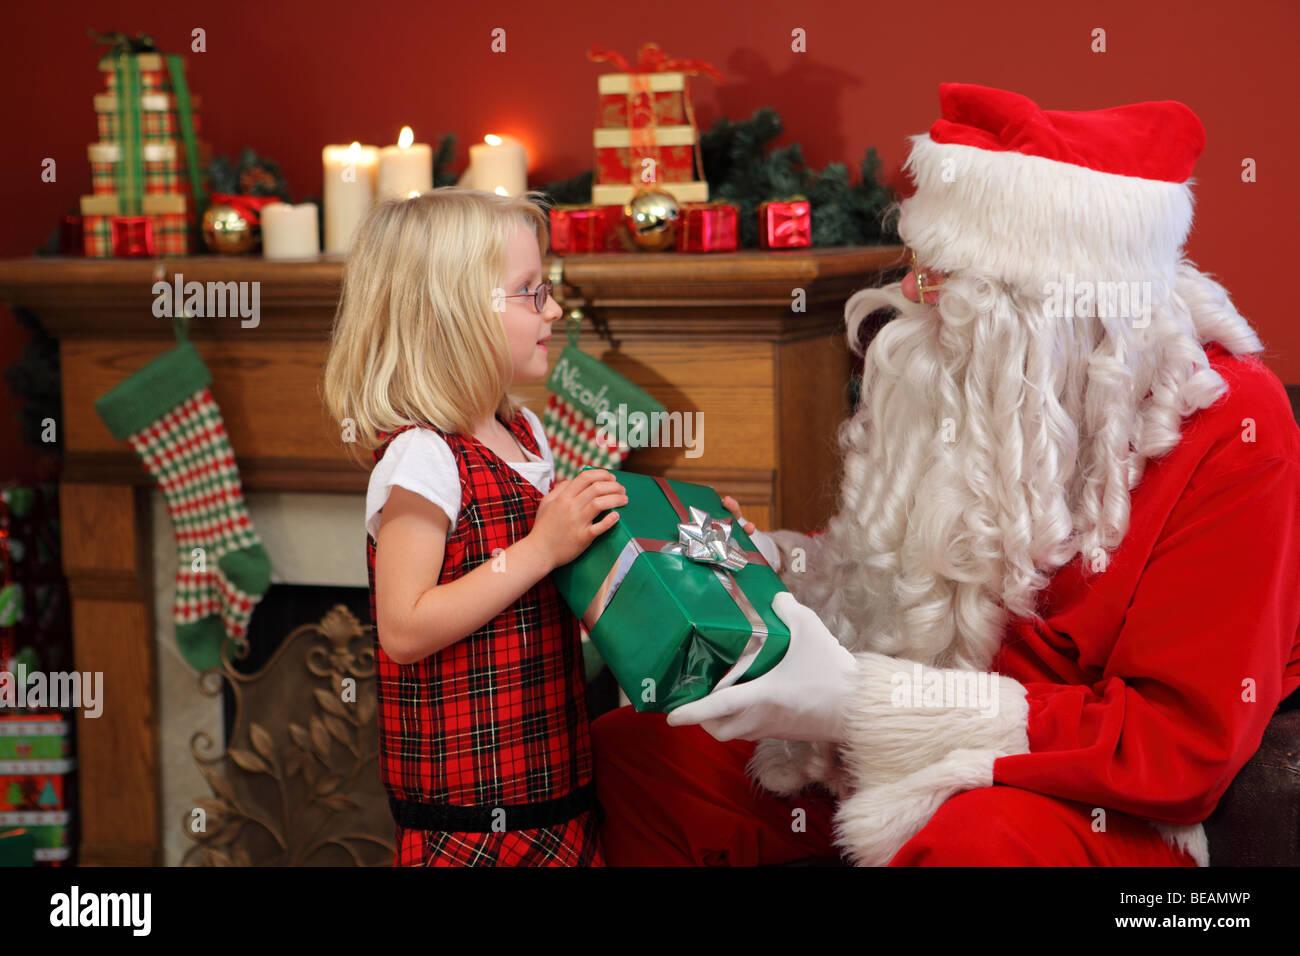 Santa Claus gives young girl Christmas gift - Stock Image